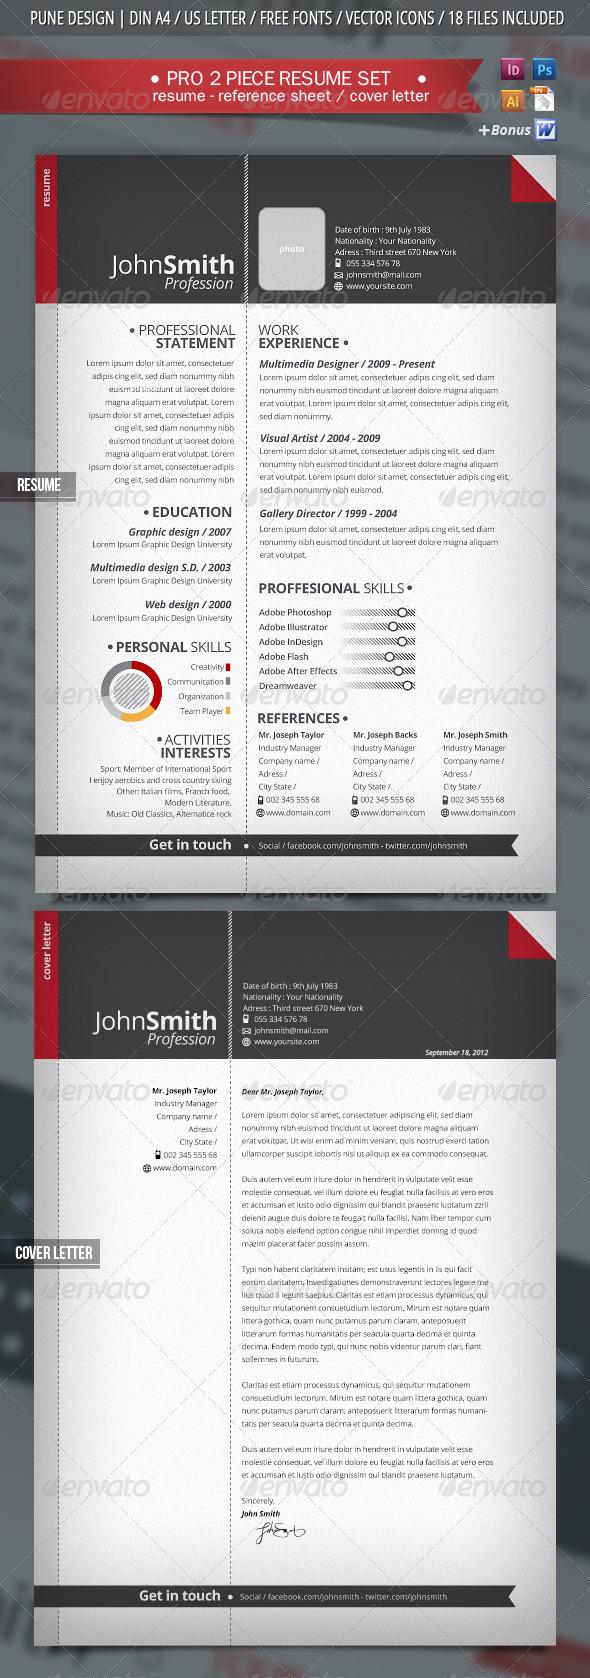 GraphicRiver 2-Piece Pro Resume & Cover Letter 2858605